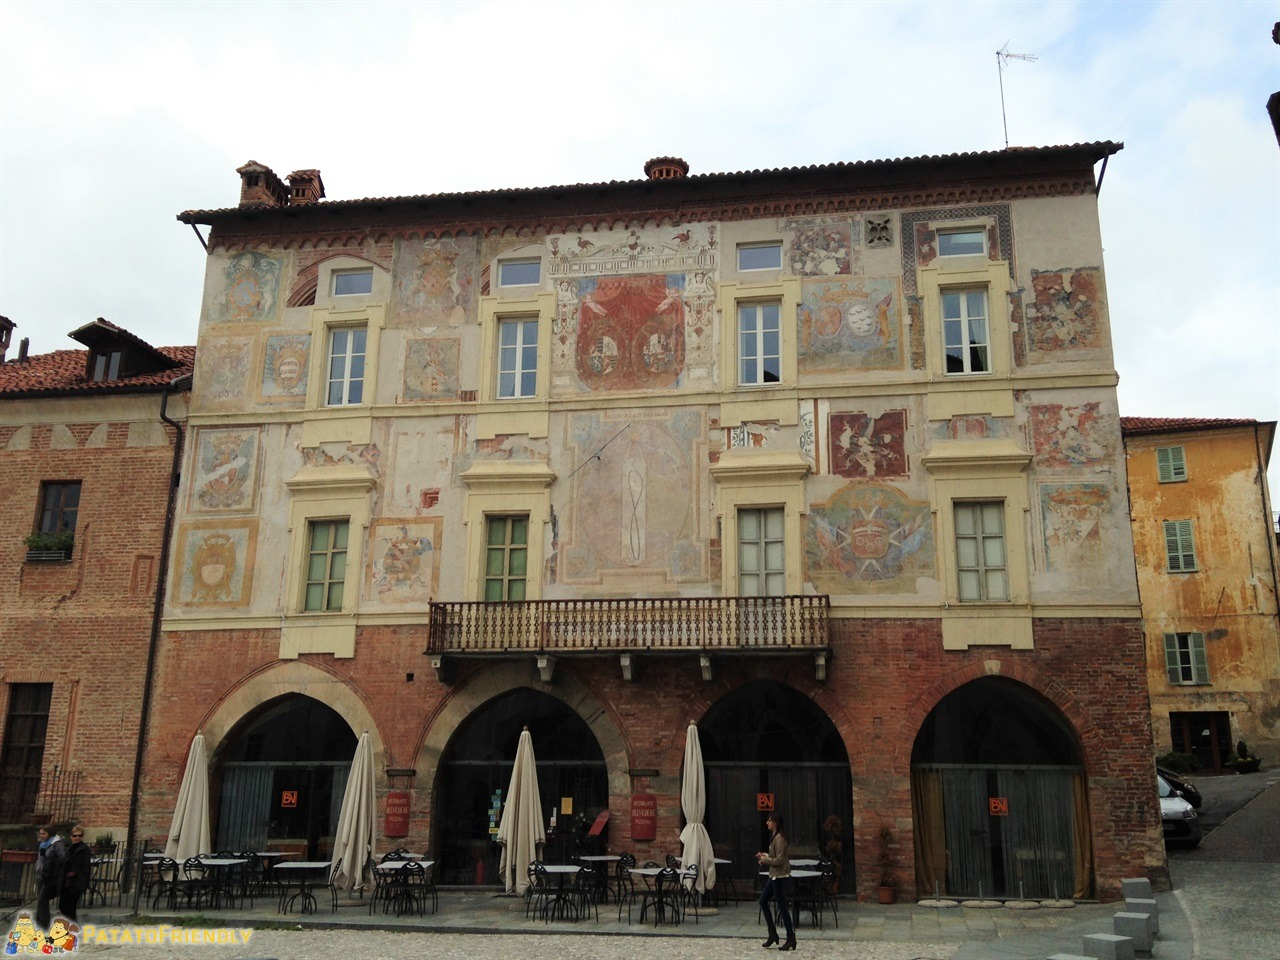 [cml_media_alt id='6559']Mondovì e i suoi antici palazzi nel centro[/cml_media_alt]